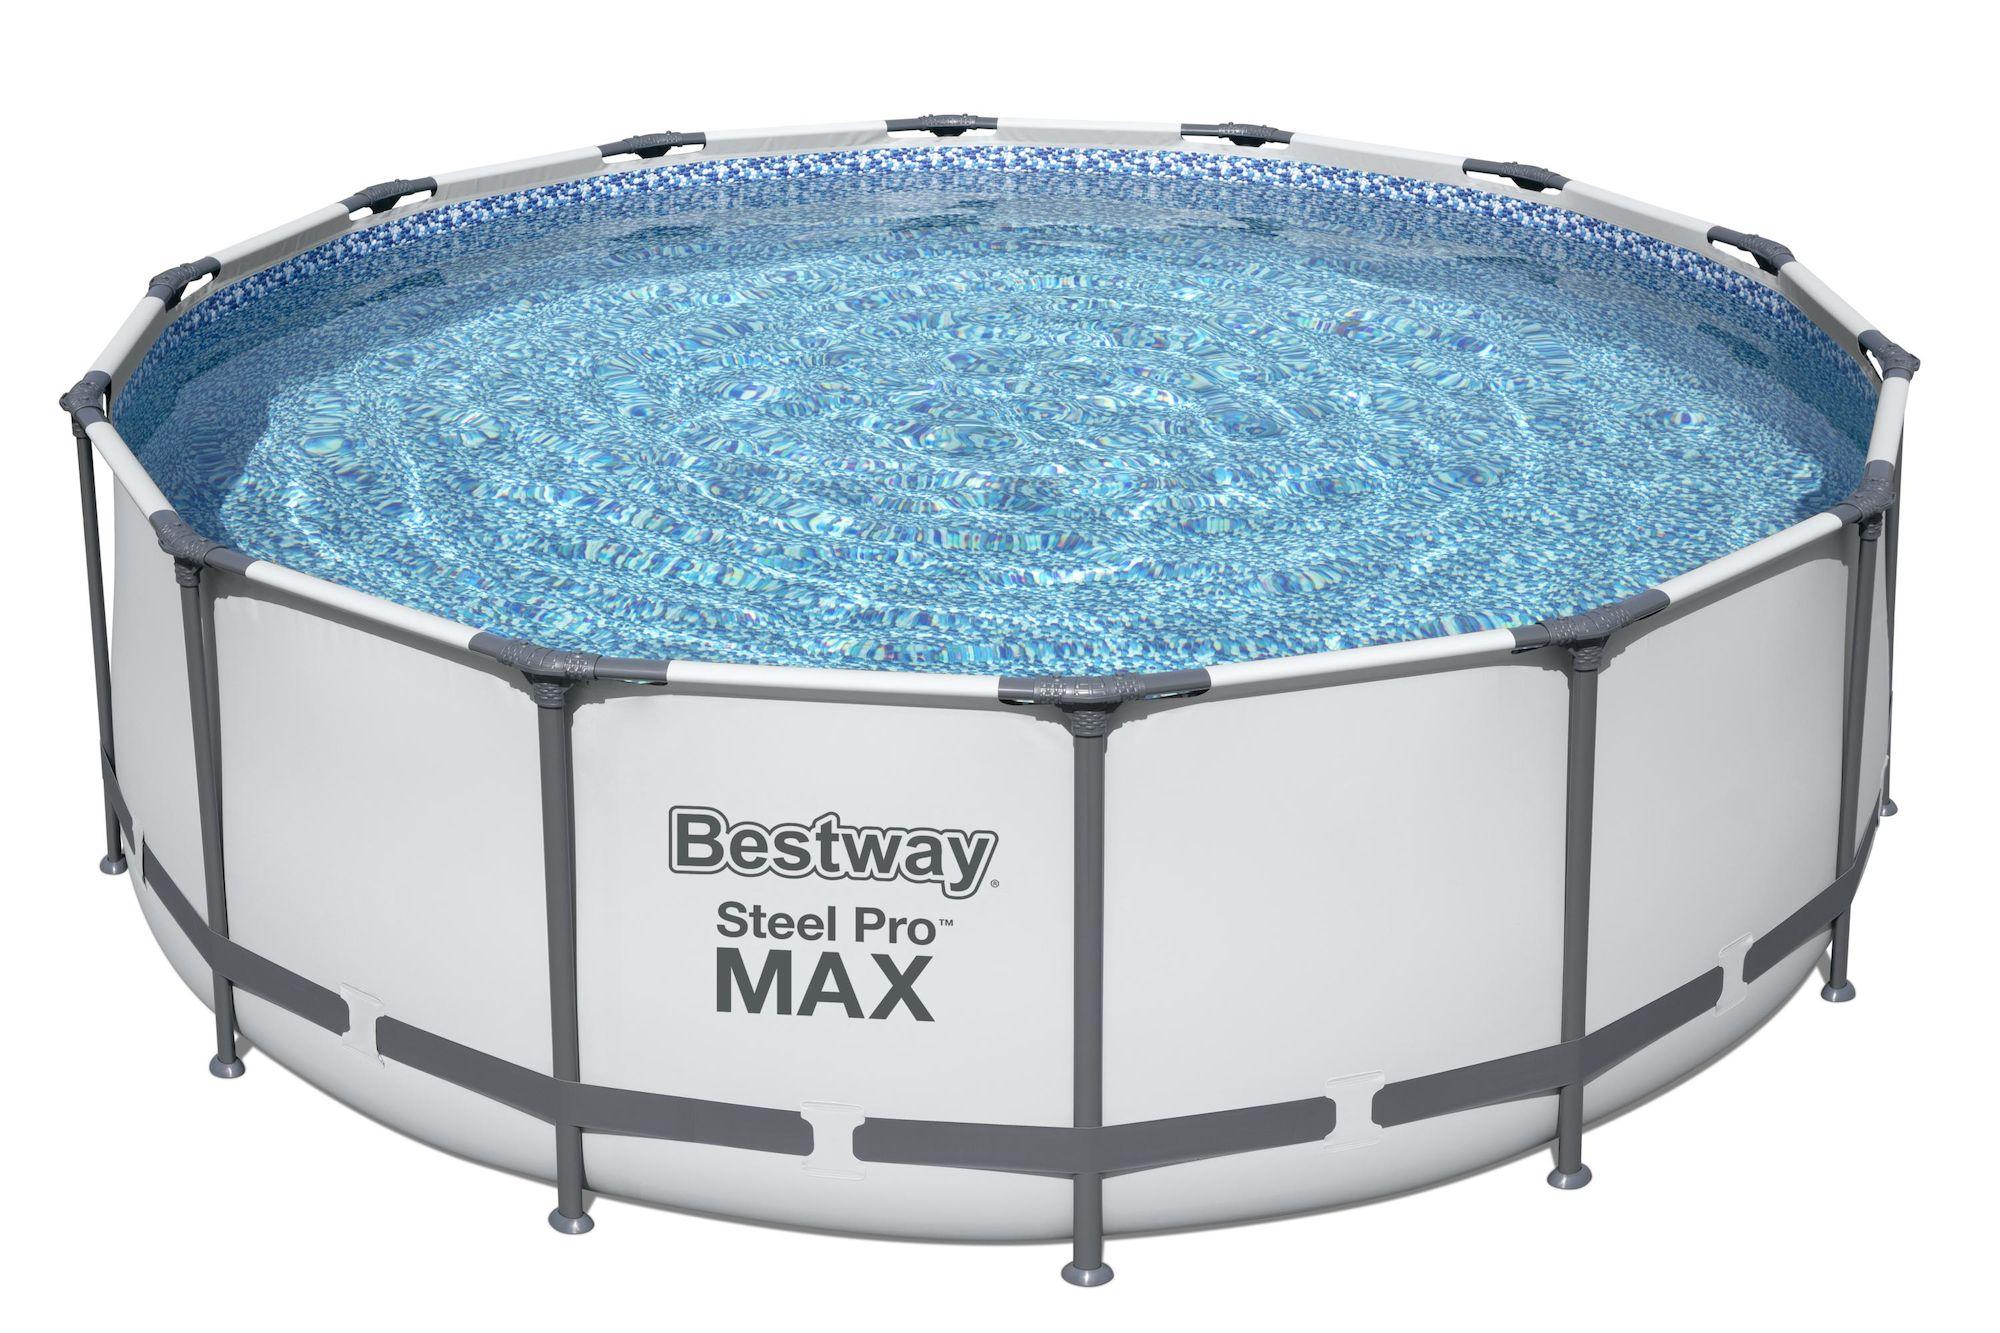 Bestway Steel Pro MAX Pool m. Tillbehör 4.27m x 1.22m